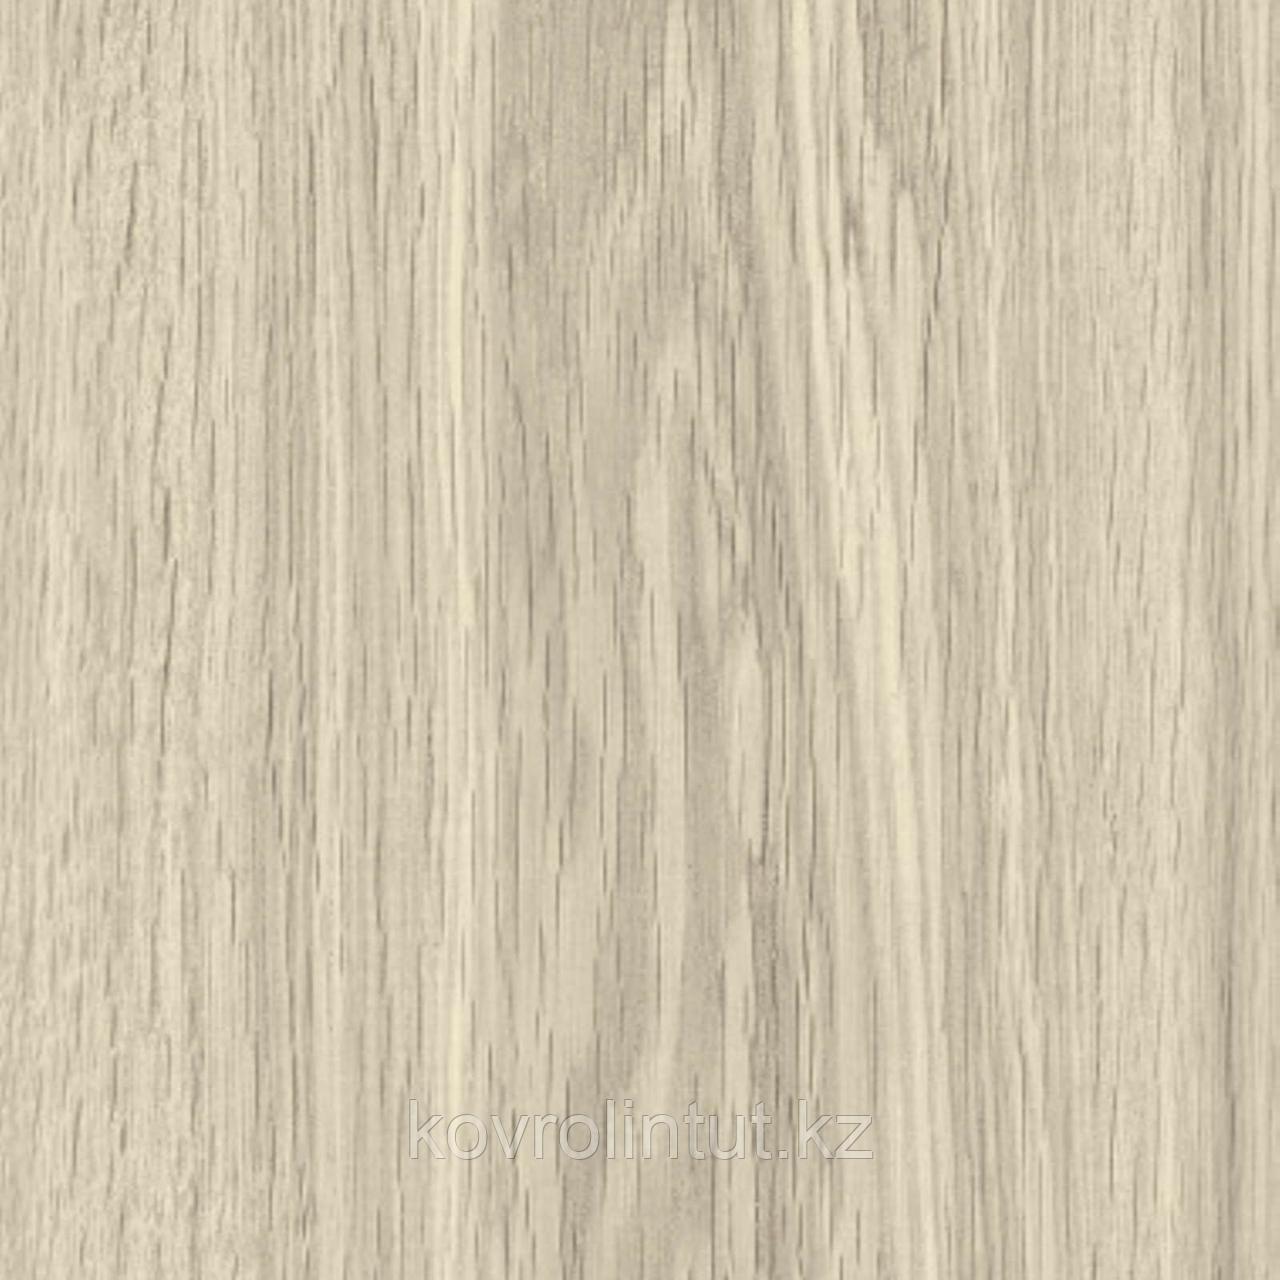 Плитка ПВХ клеевая IVC Ultimo Casablanca Oak 24123Q